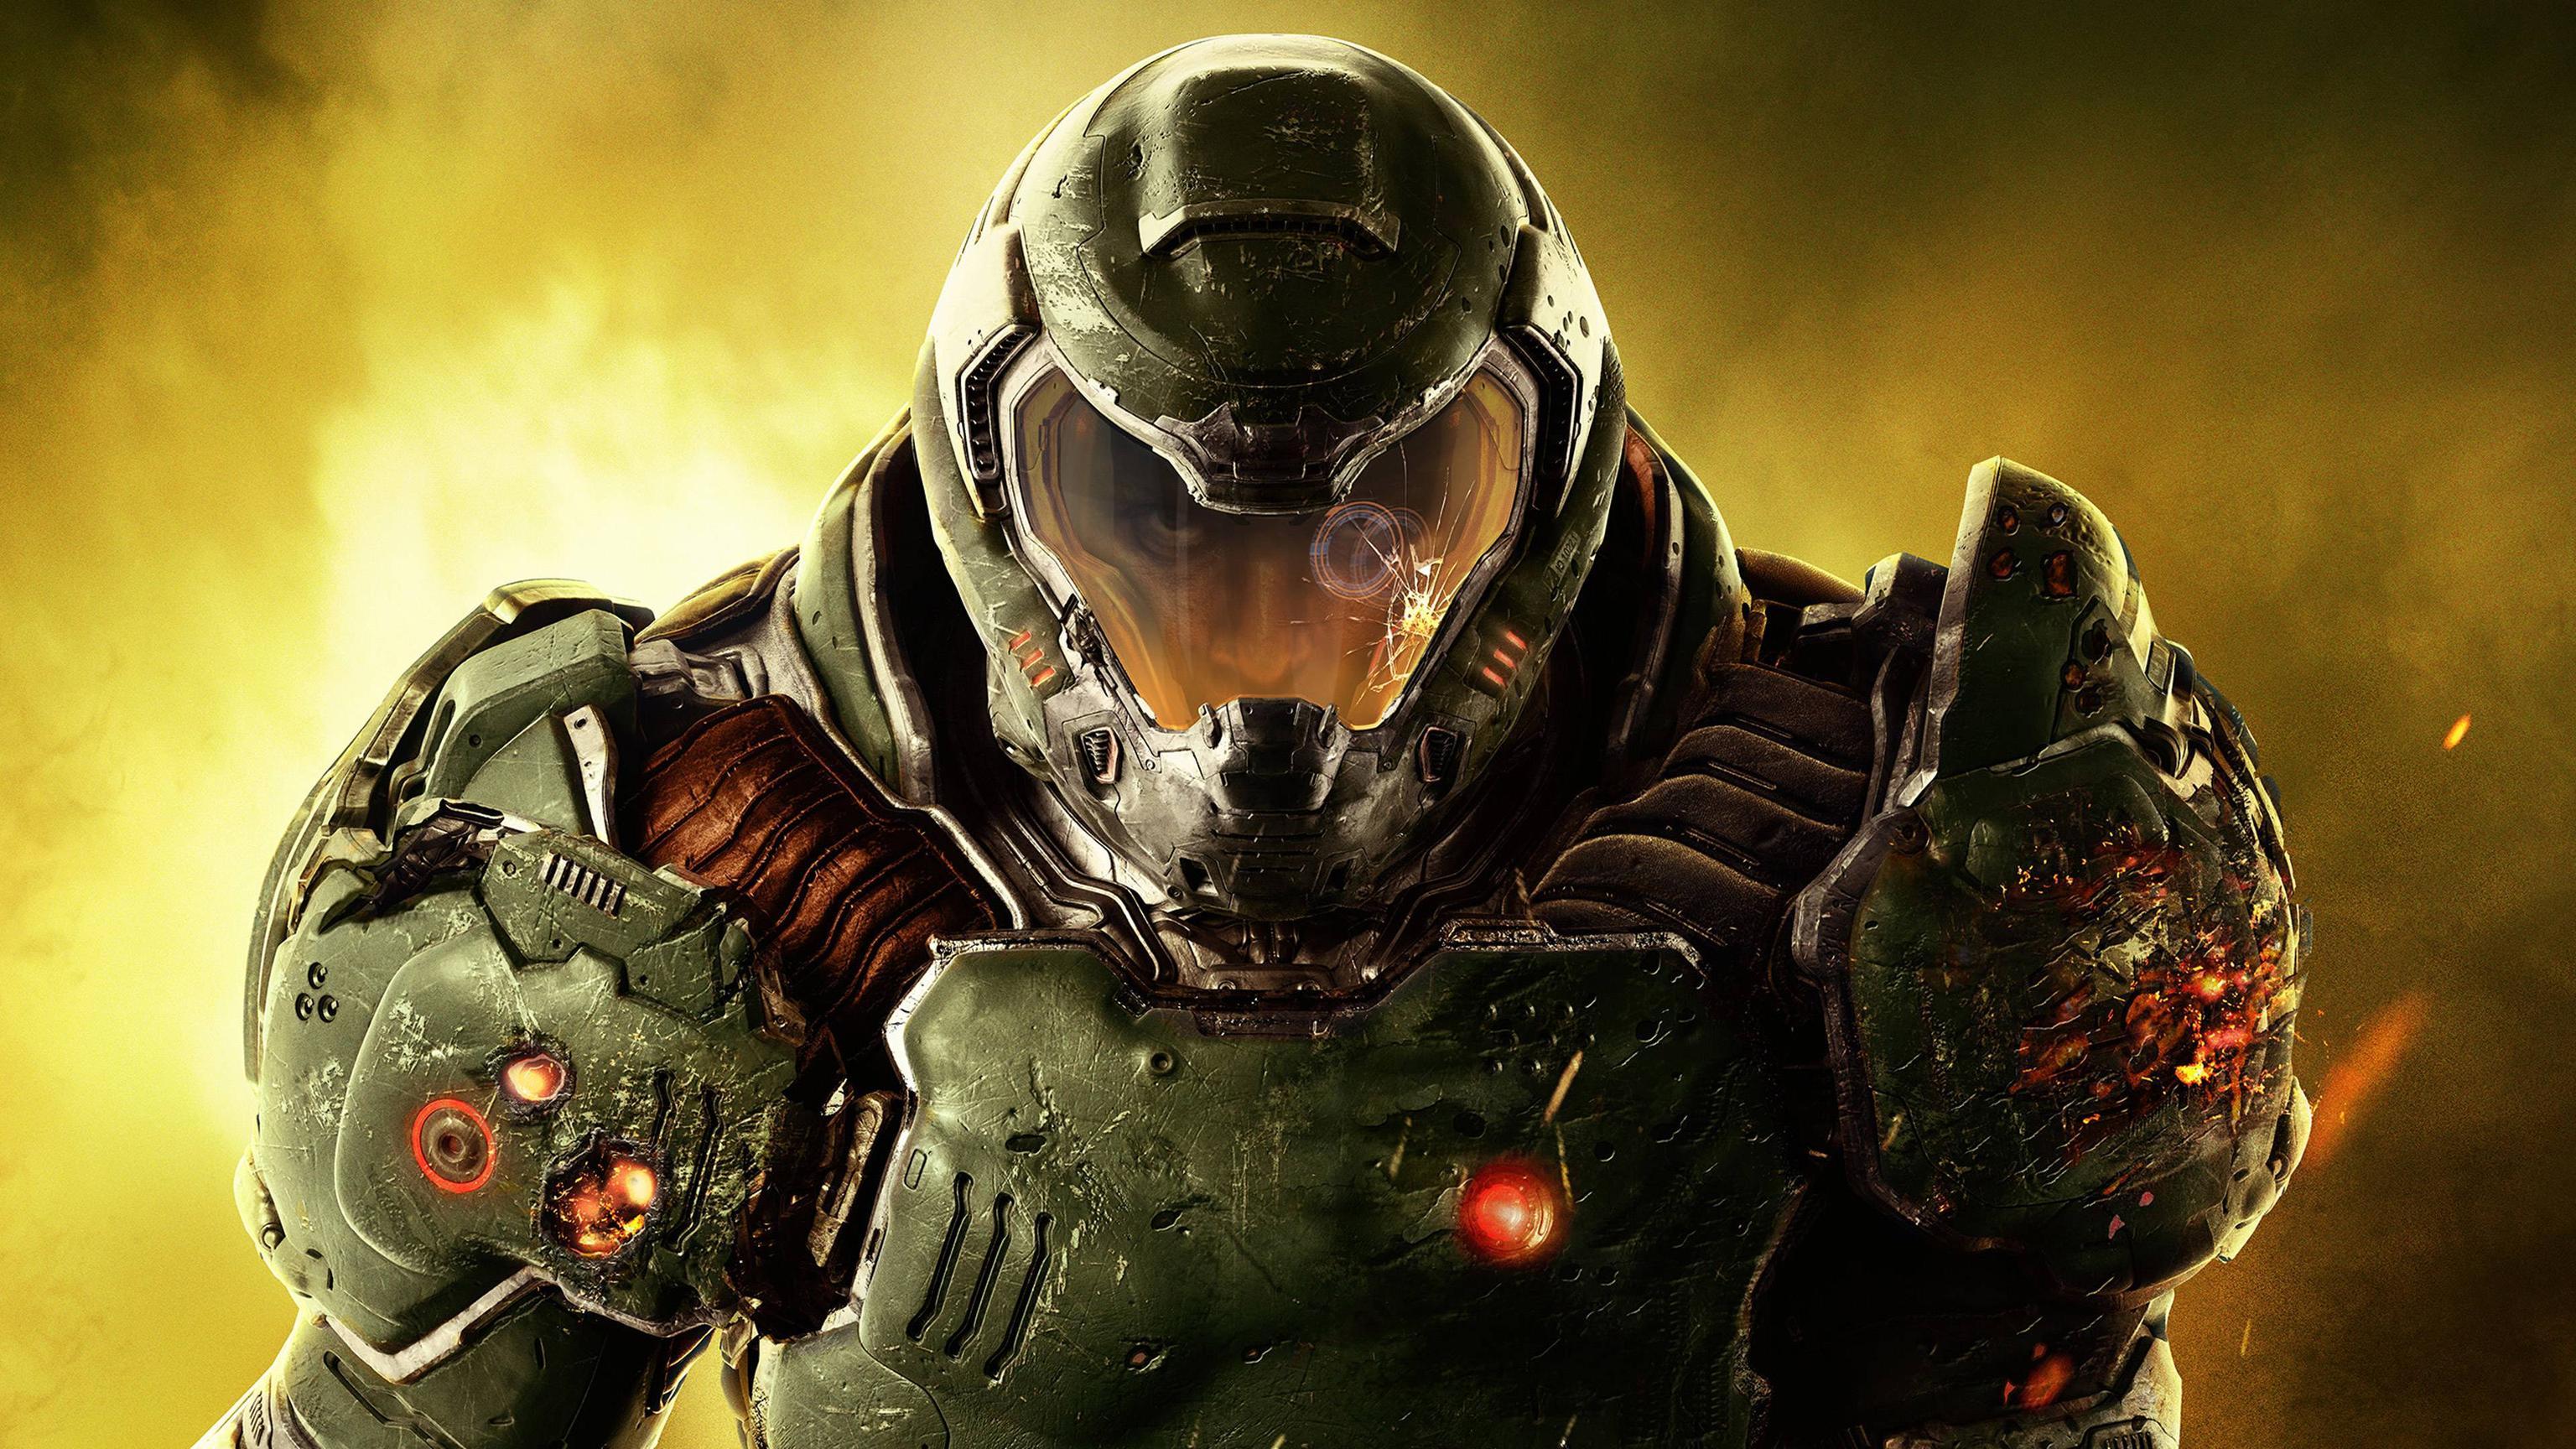 Doom 4 2016 Video Game, Hd Games, 4k Wallpapers, Images